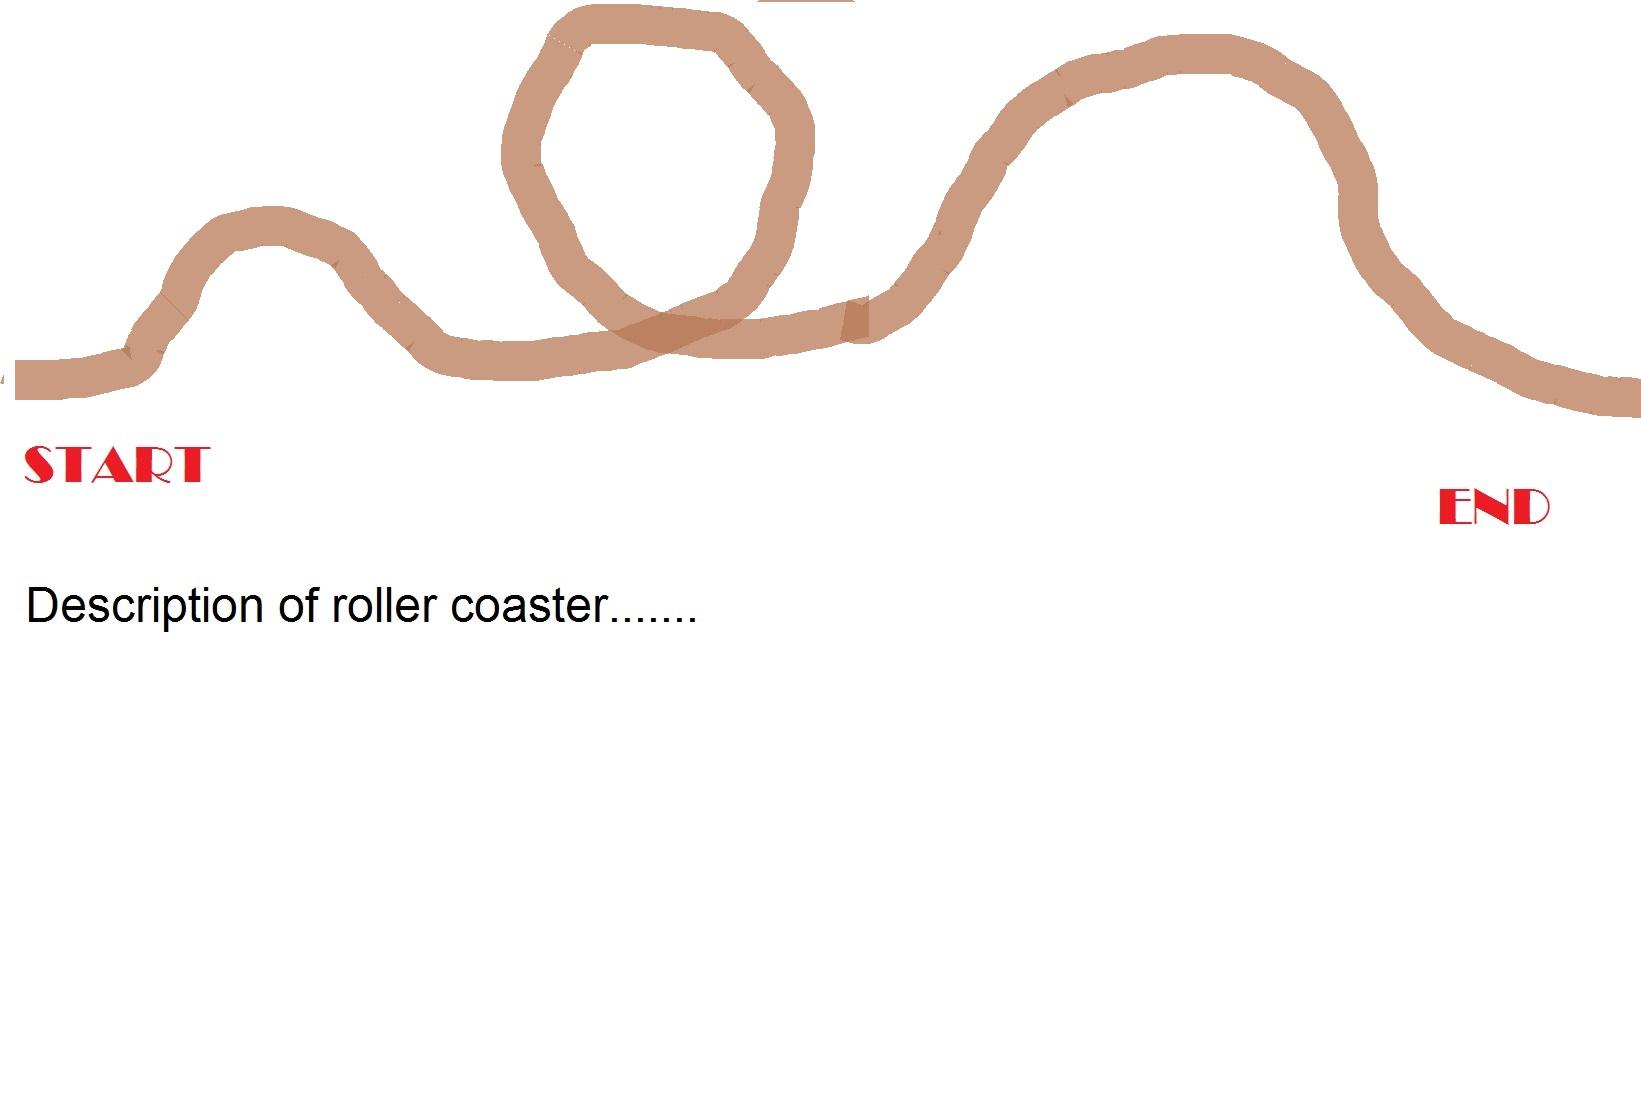 Science PreK6 STEAM Gr 4 Roller coaster Physics – Roller Coaster Physics Worksheet